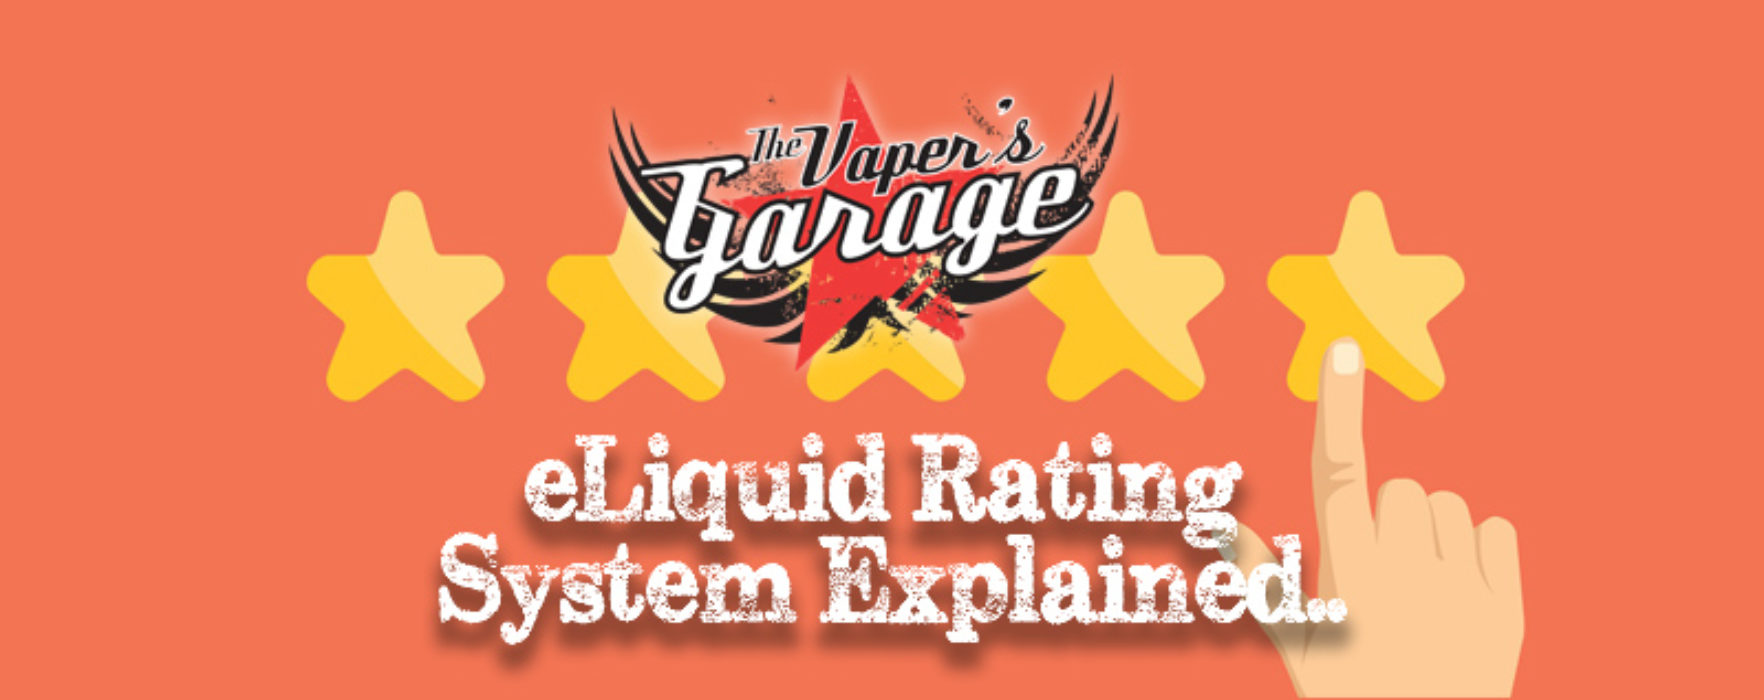 Vapers Garage eLiquid Ratings Explained